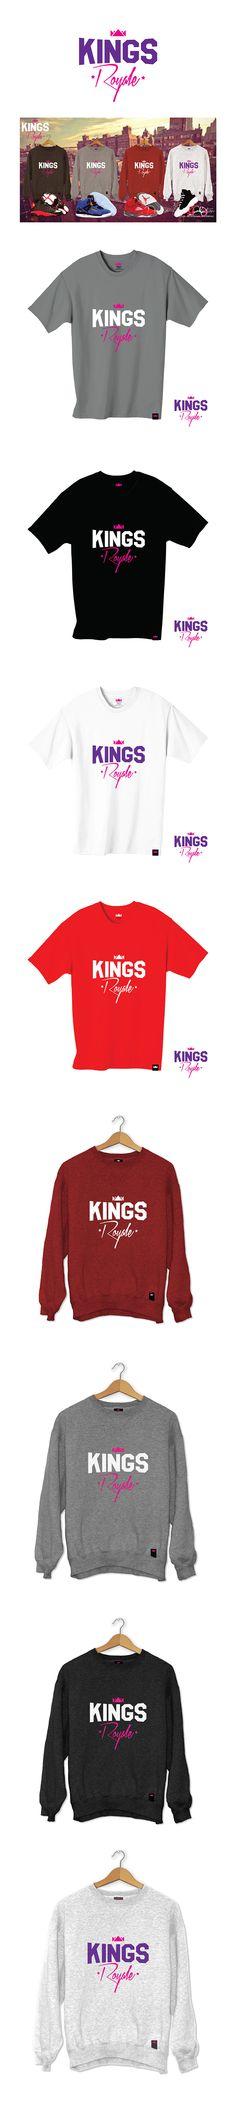 Kings Royale - Product Range & Branding on Behance Streetwear Brands, Street Wear, Behance, Range, Branding, Design, Cookers, Brand Management, Ranges